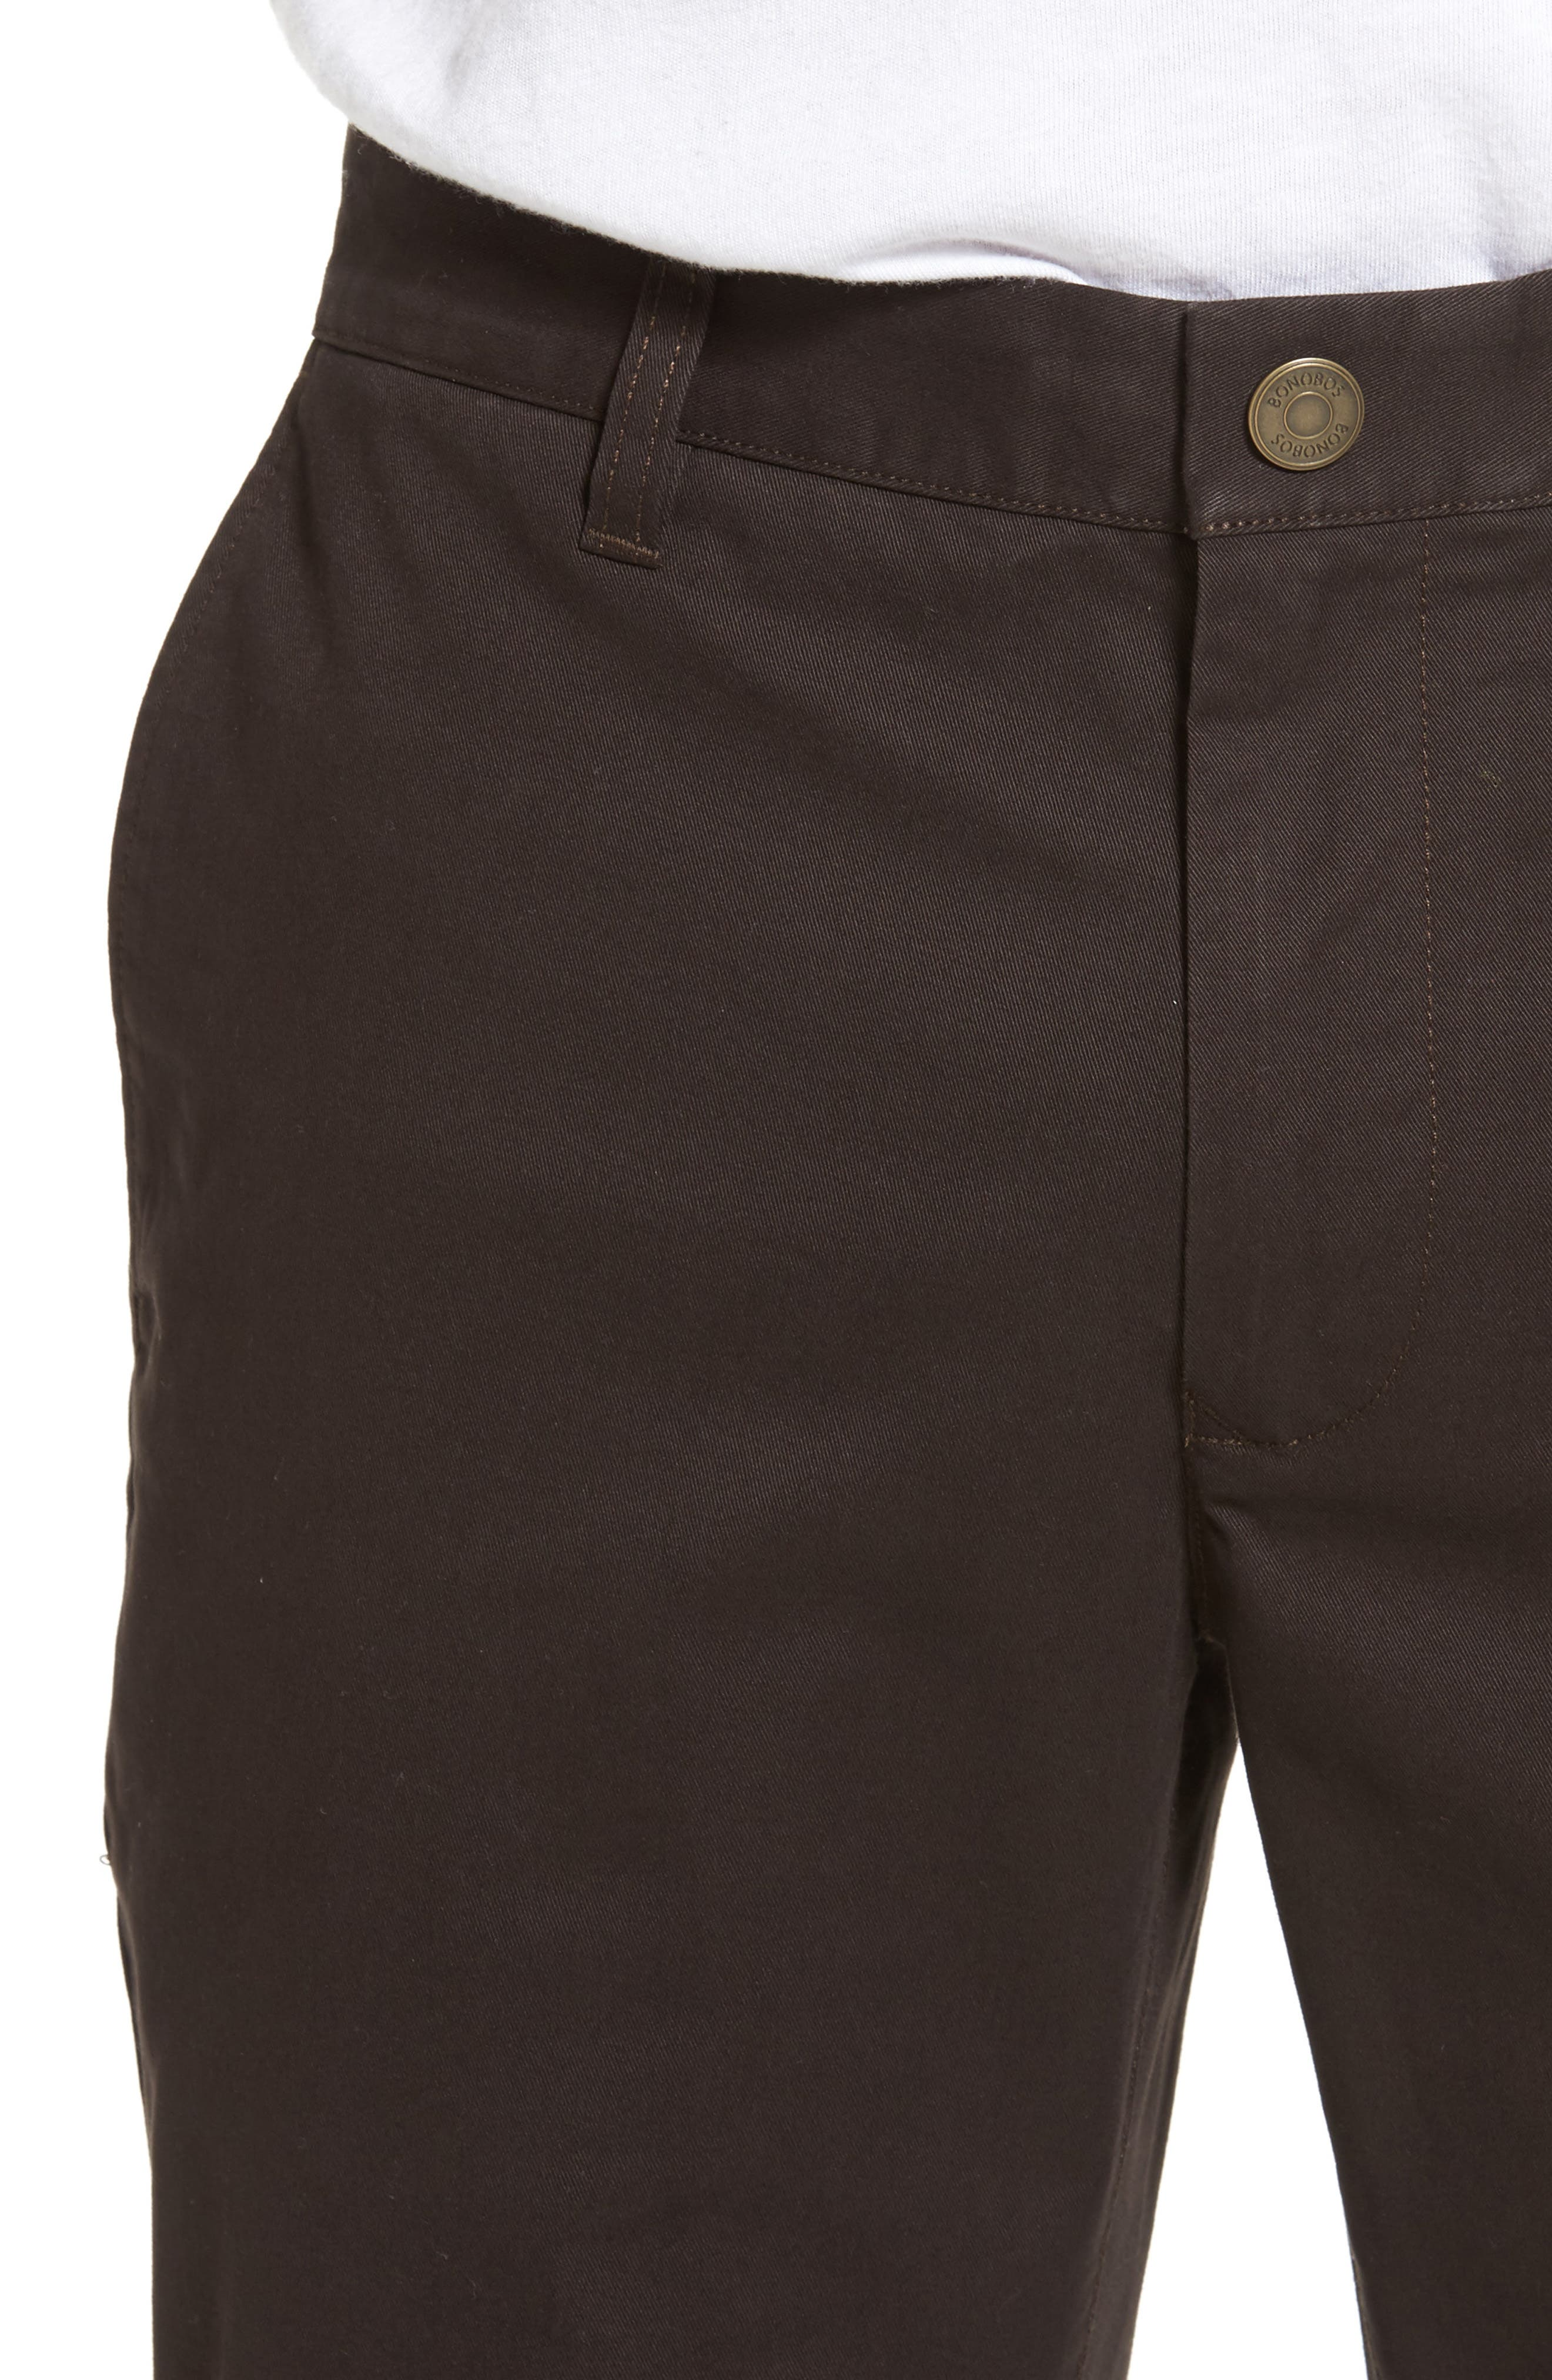 Tellis Modern Slim Twill Pants,                             Alternate thumbnail 4, color,                             2 Years Field Stone